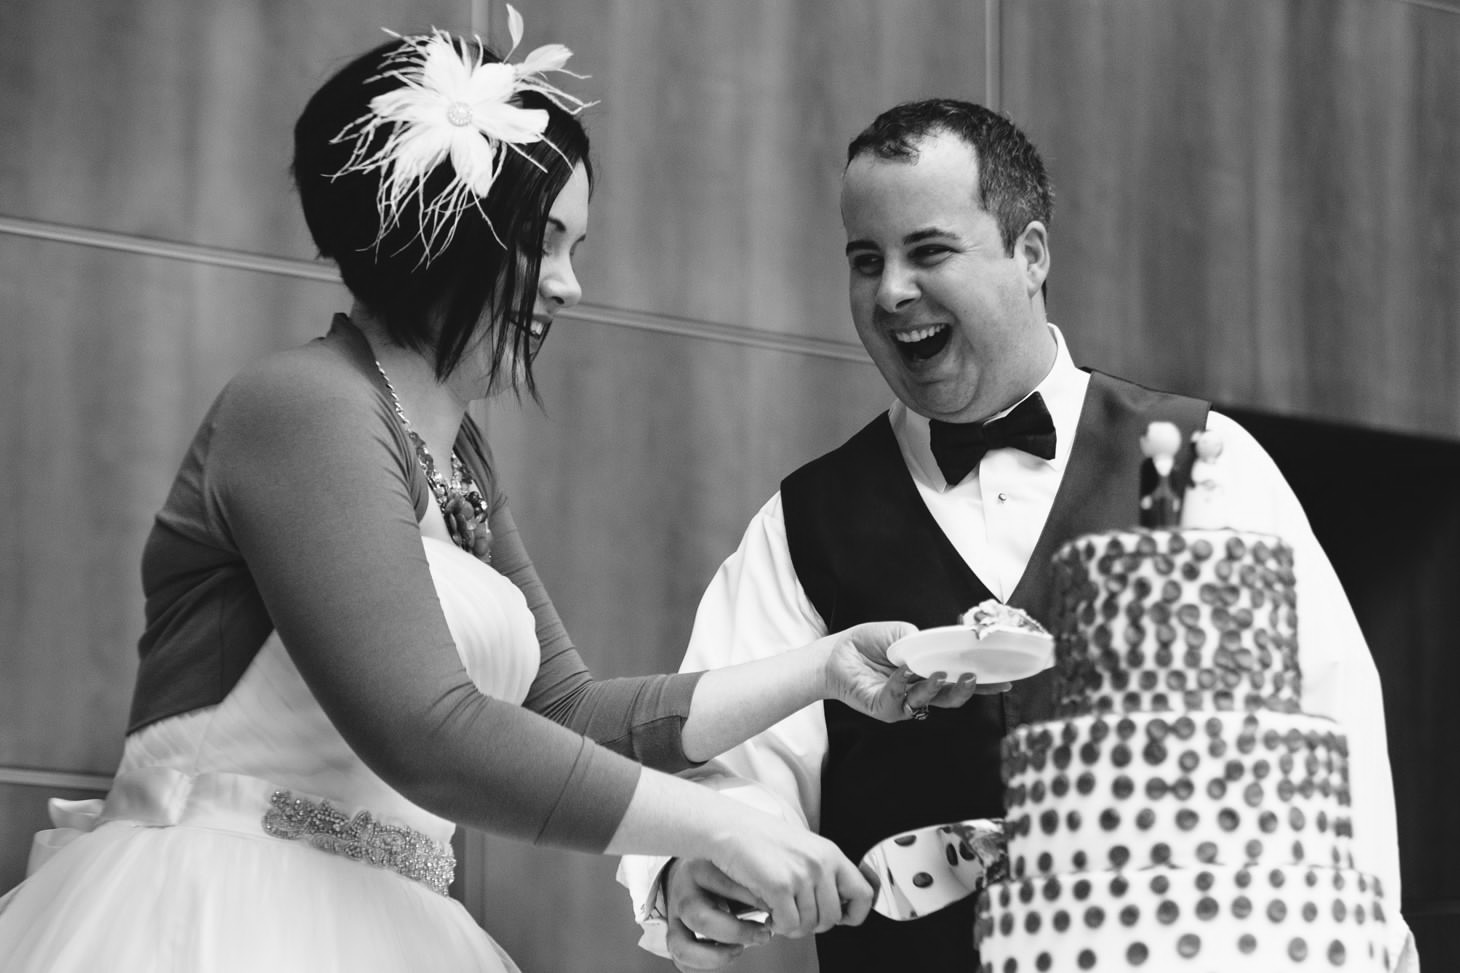 057-nyc-wedding-photographer-smitten-chickens-nj-montclair-art-museum.jpg